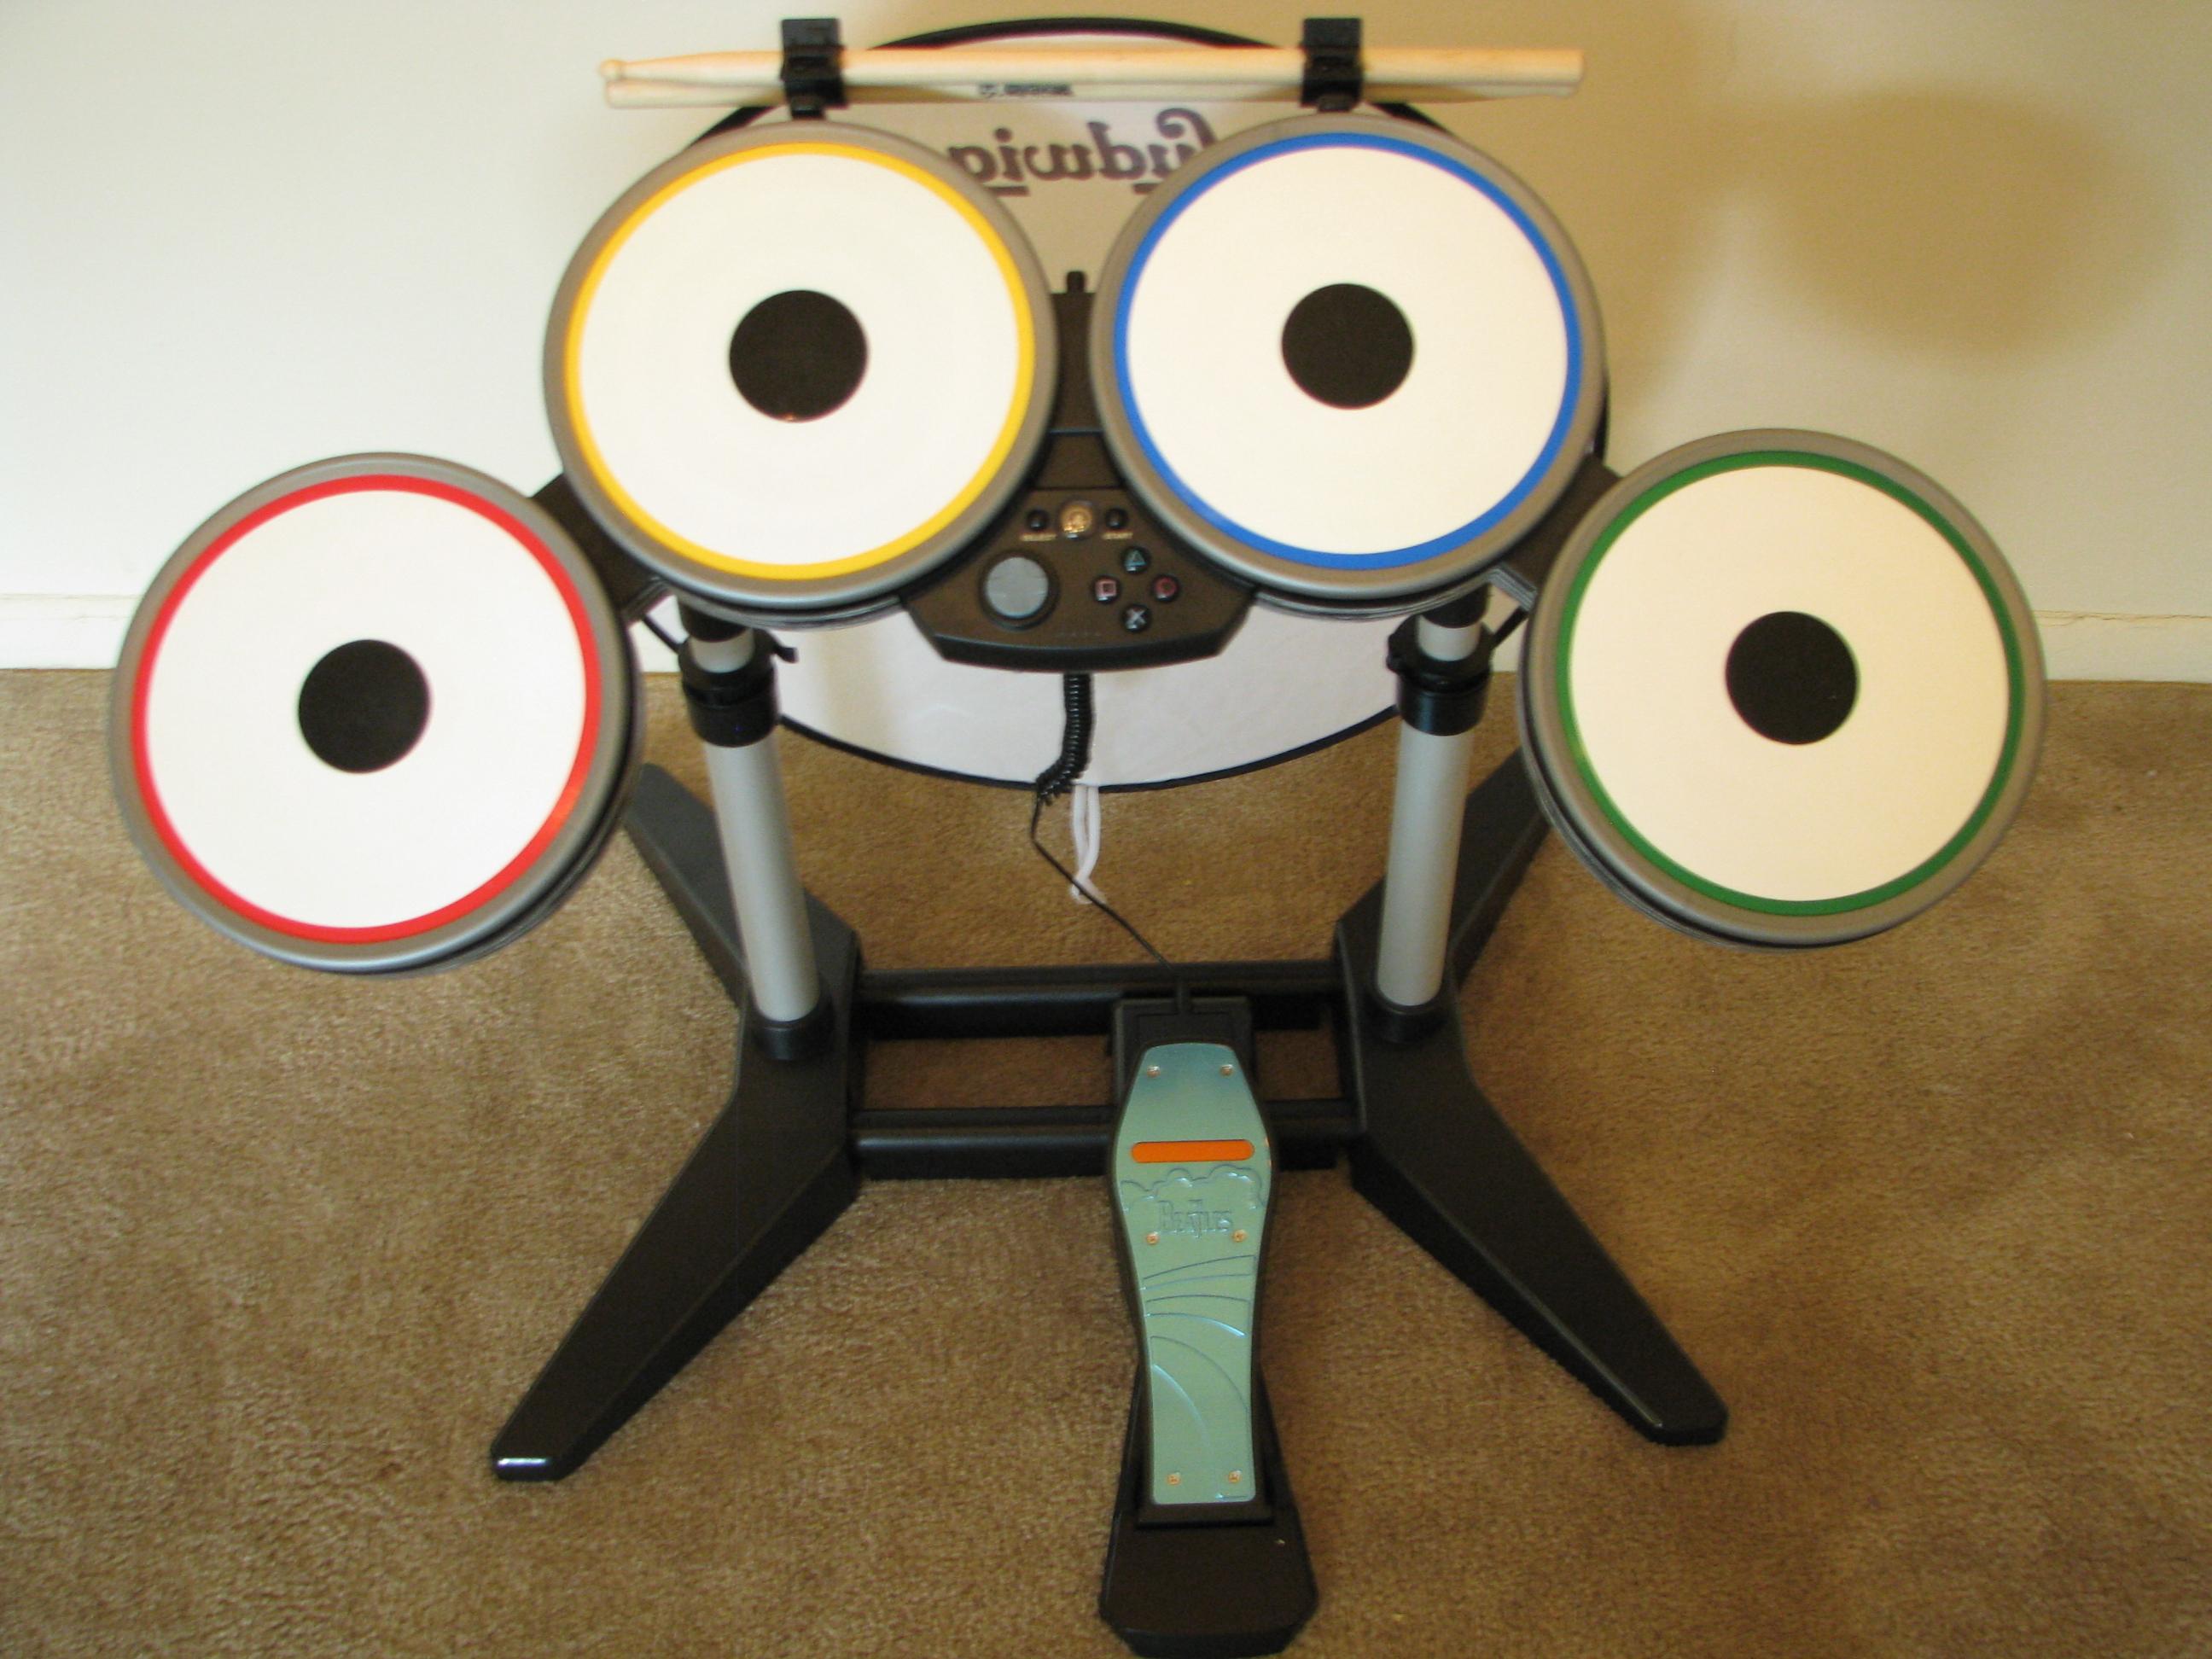 File:The Beatles Rock Band - Drum set jpg - Wikimedia Commons